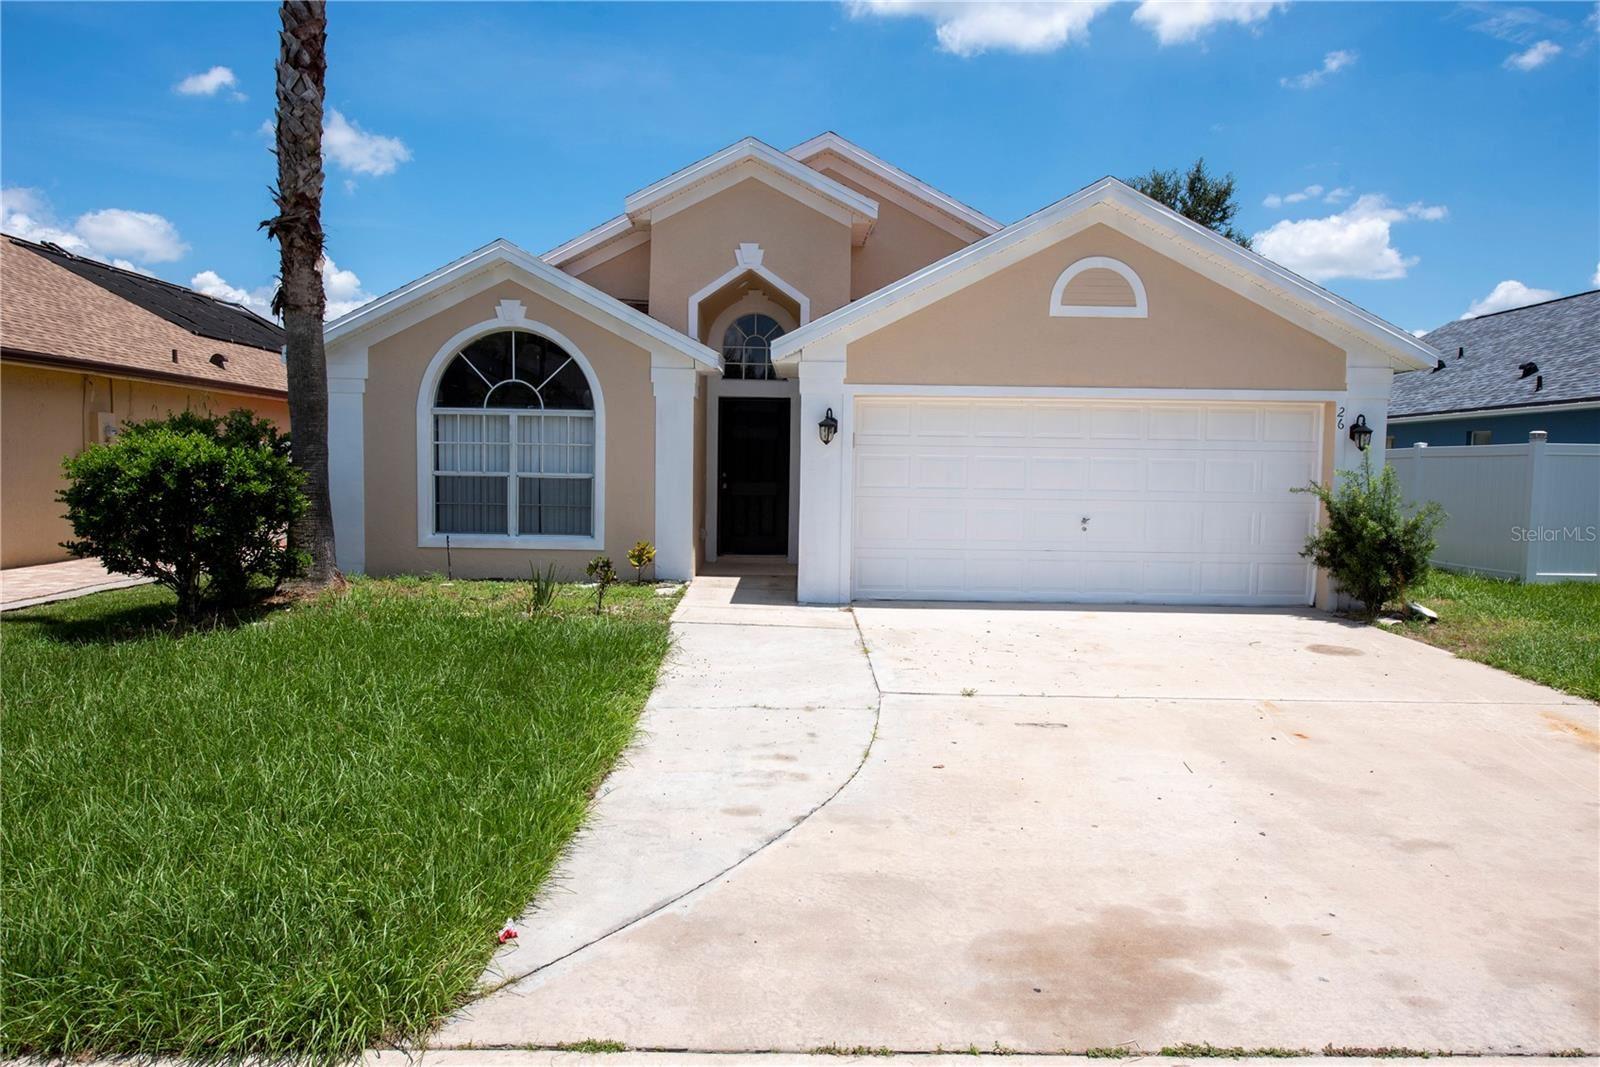 26 SURA BOULEVARD, Orlando, FL 32809 - #: S5053930